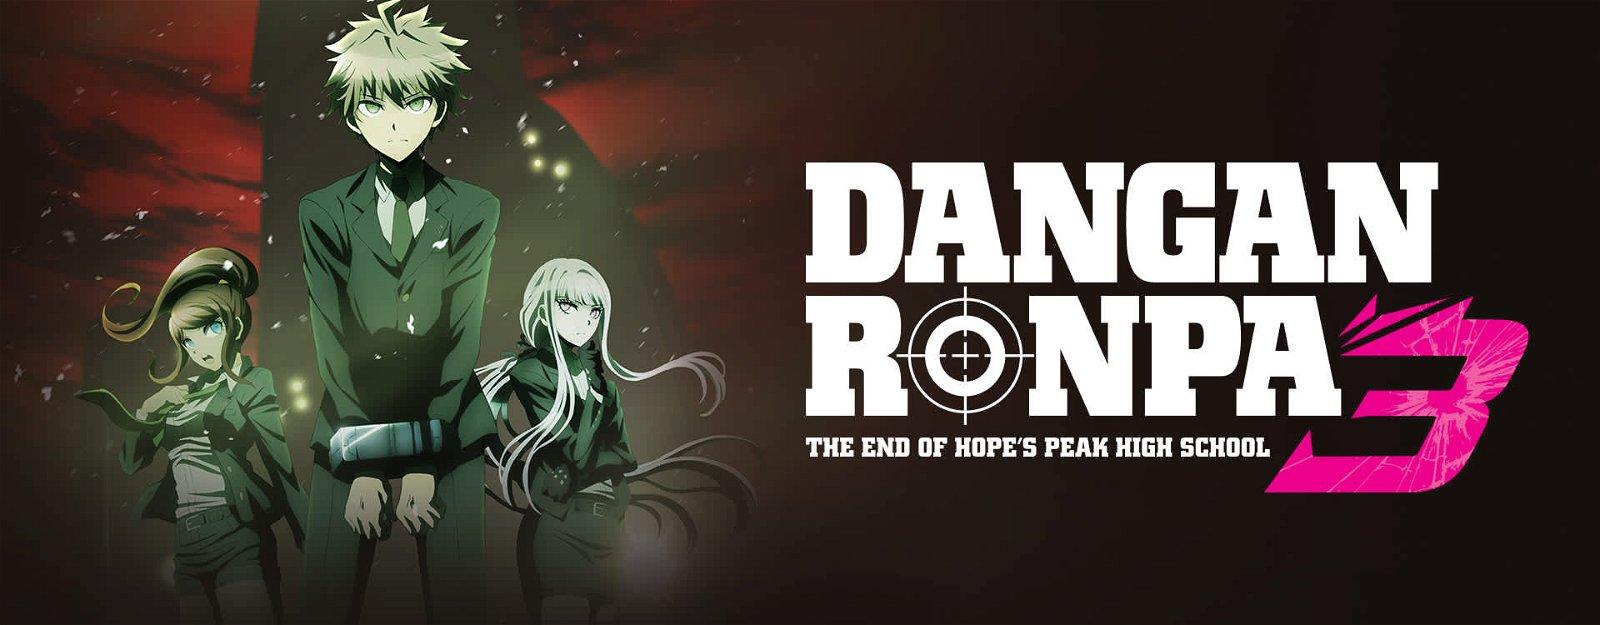 Danganronpa V3'S Ending Makes A Polarizing Case For Letting The Series Go